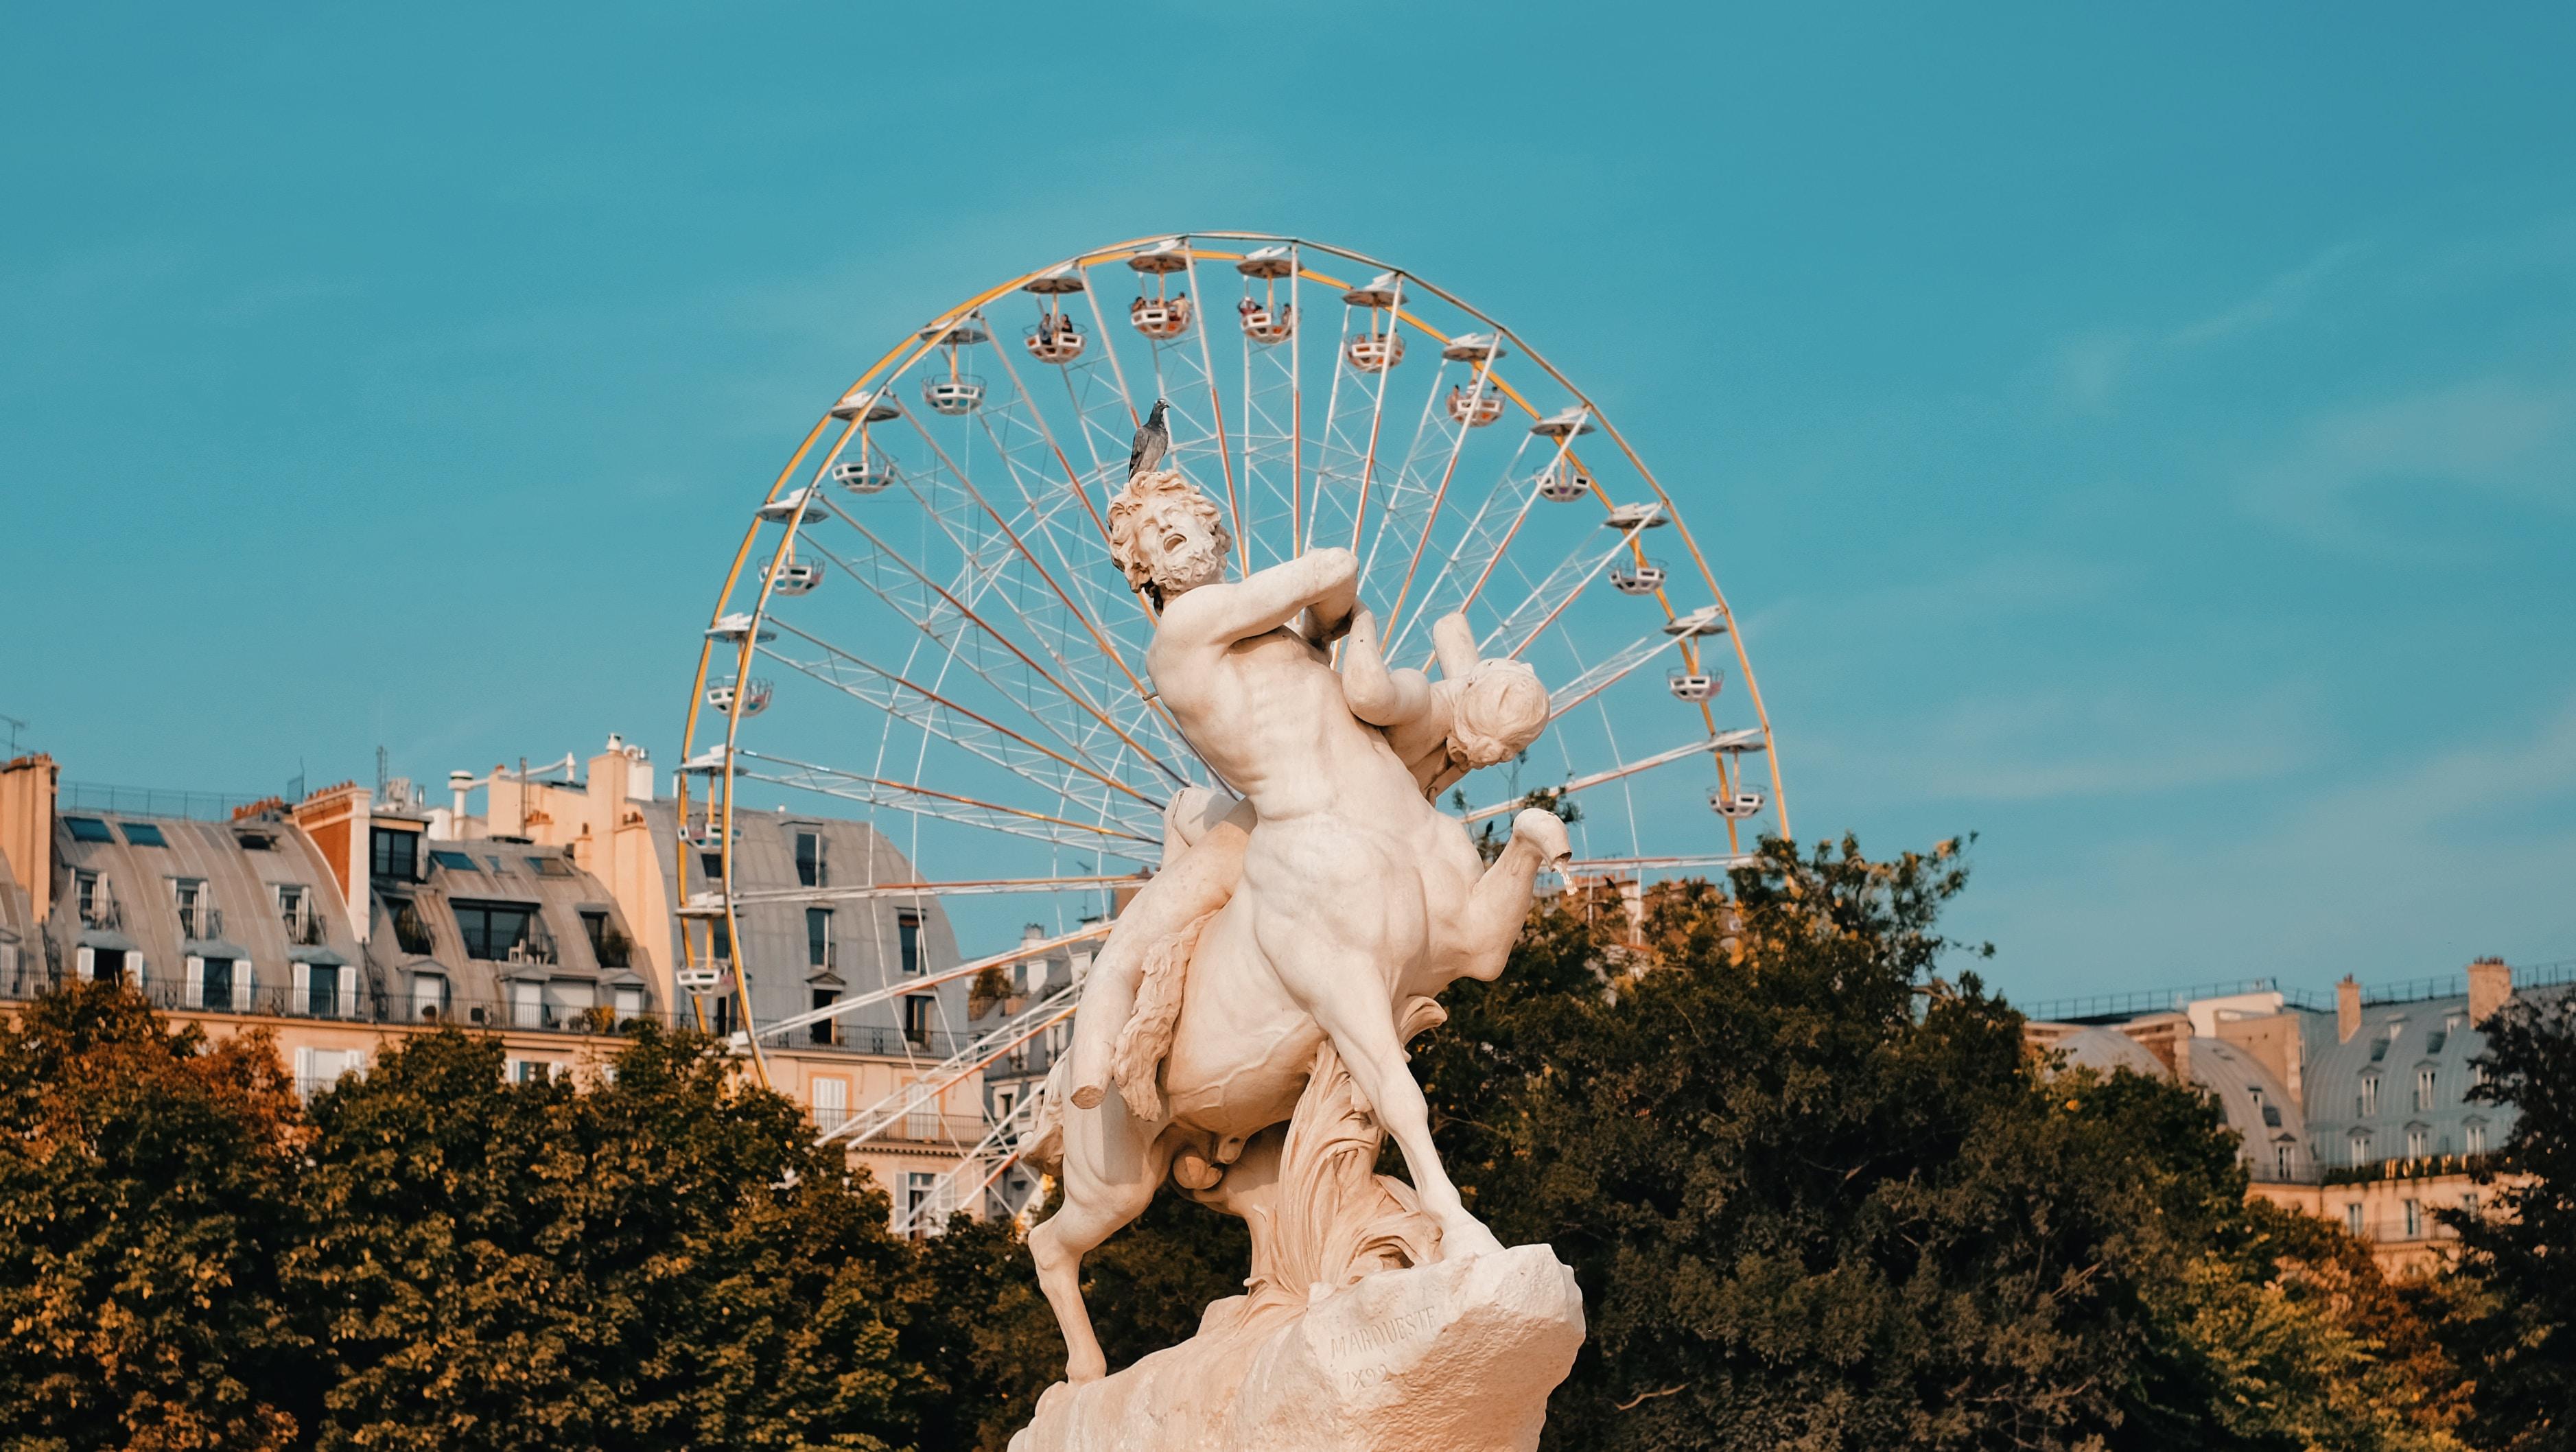 Centaur statue near trees with view of Ferris wheel during daytim